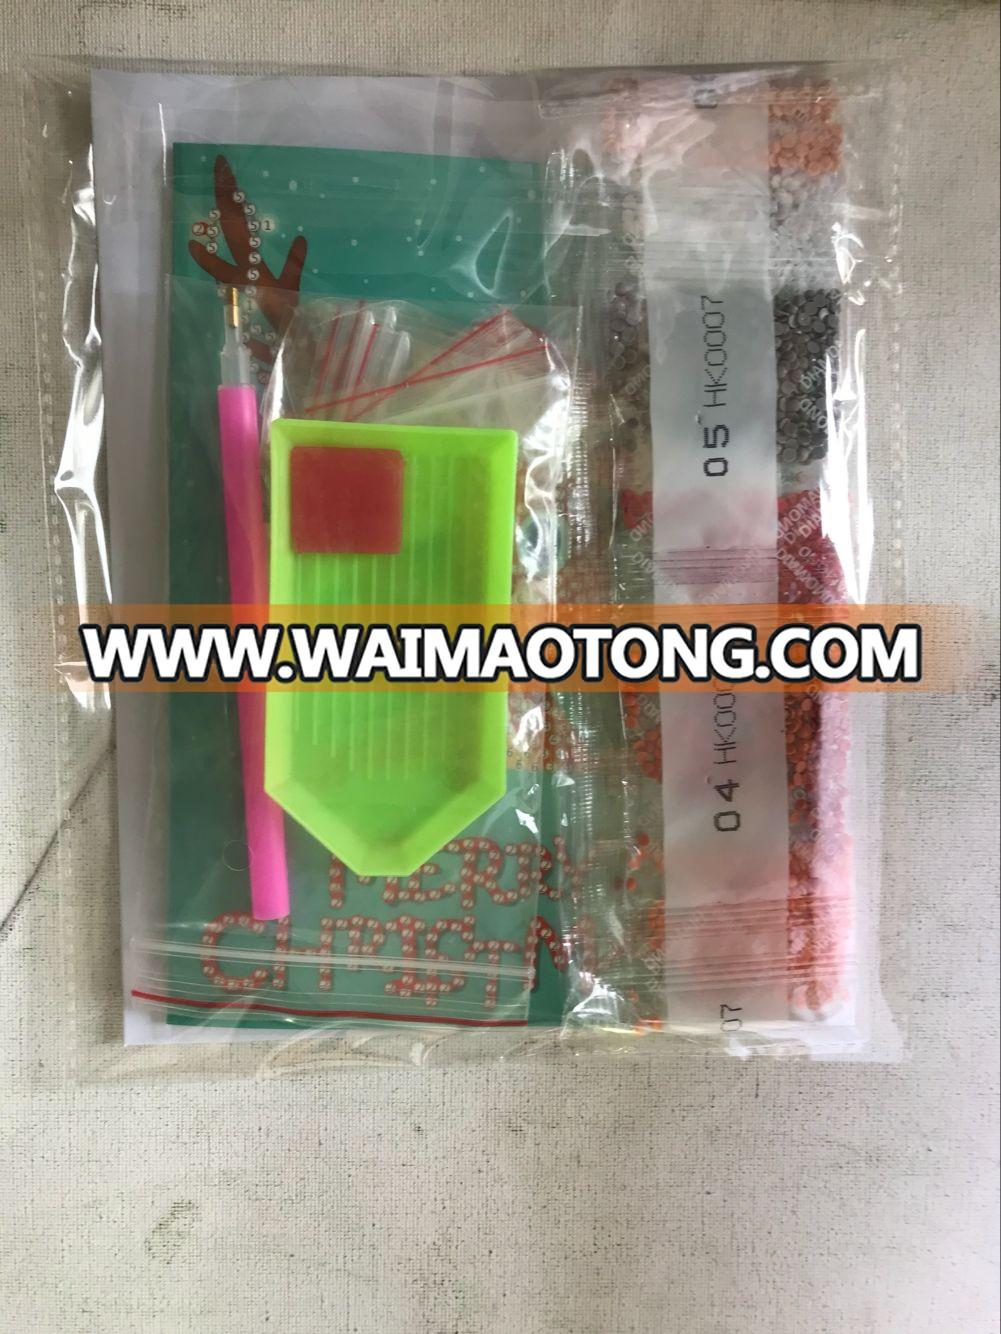 Christmas Greeting Cards DIY 5D Diamond Painting for Christmas Gift 8 pcs each set